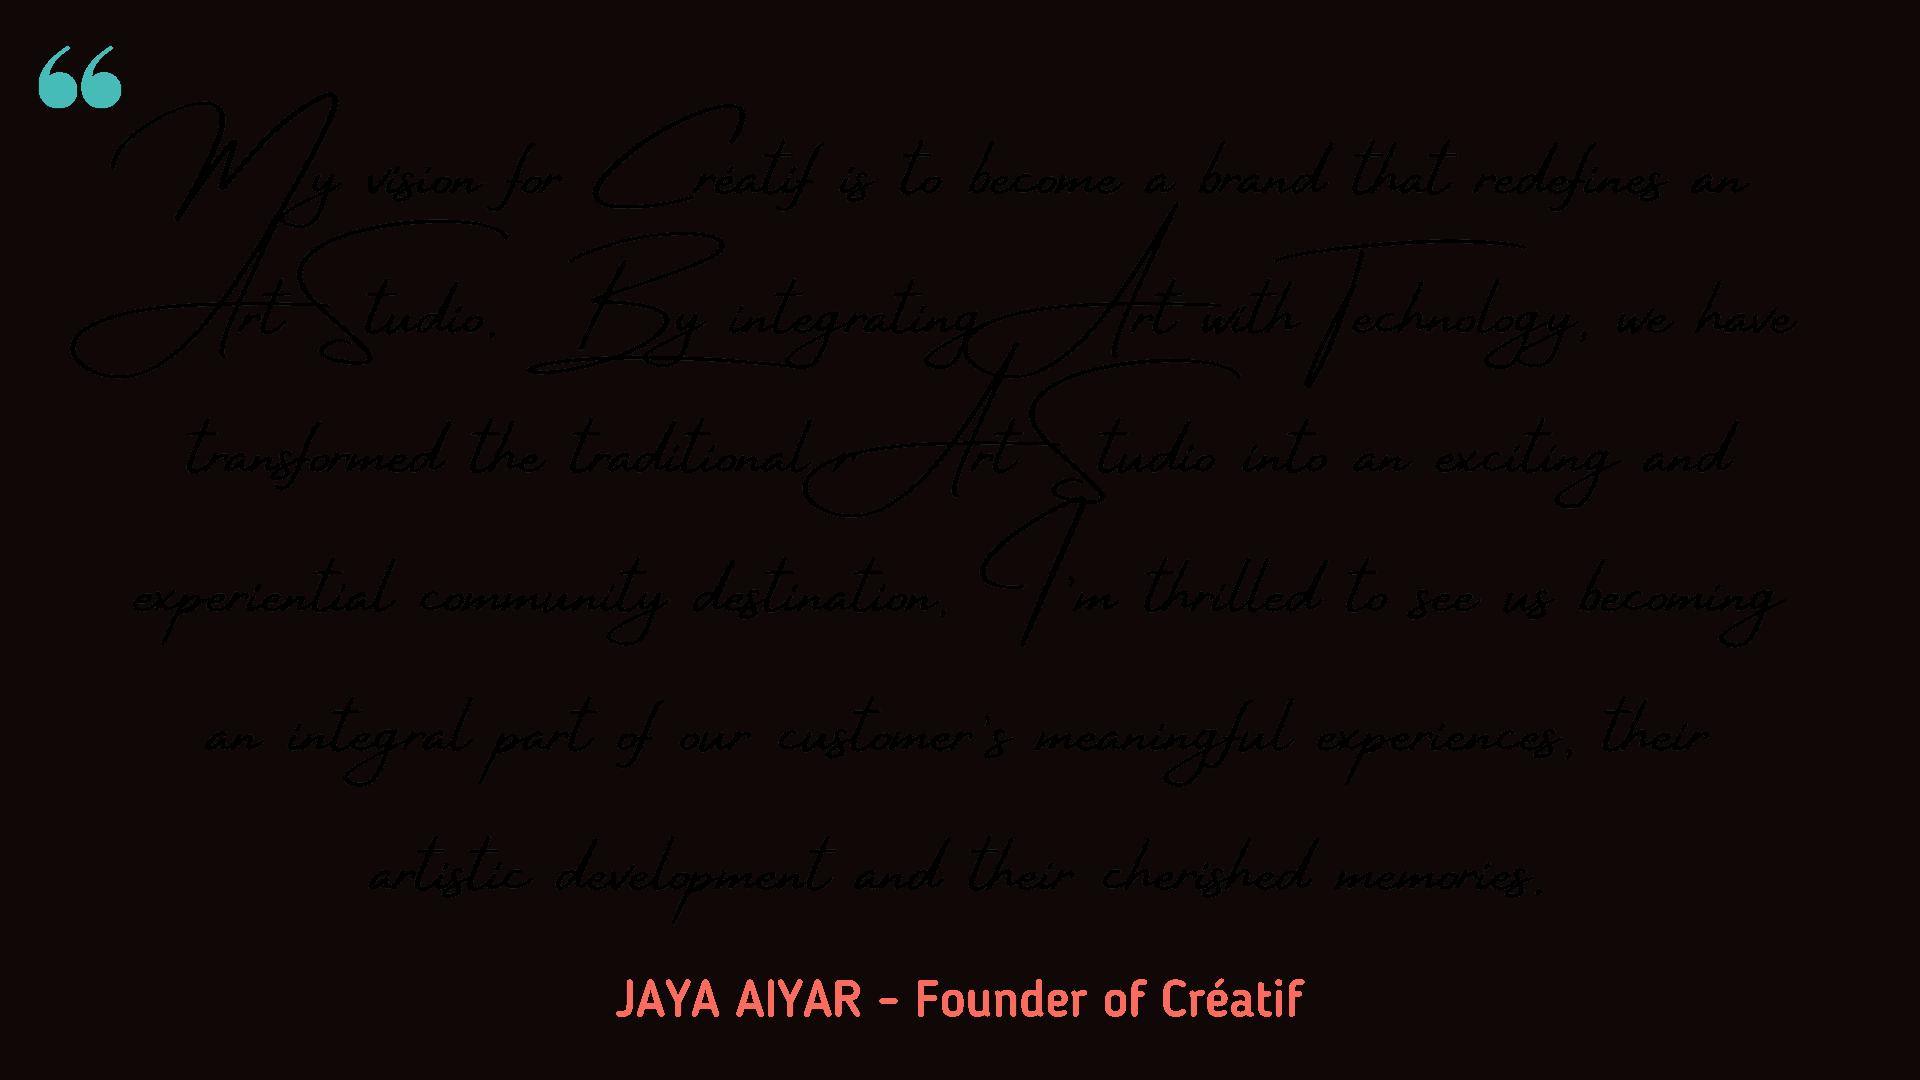 Créatif Founder Jaya Aiyar Quote